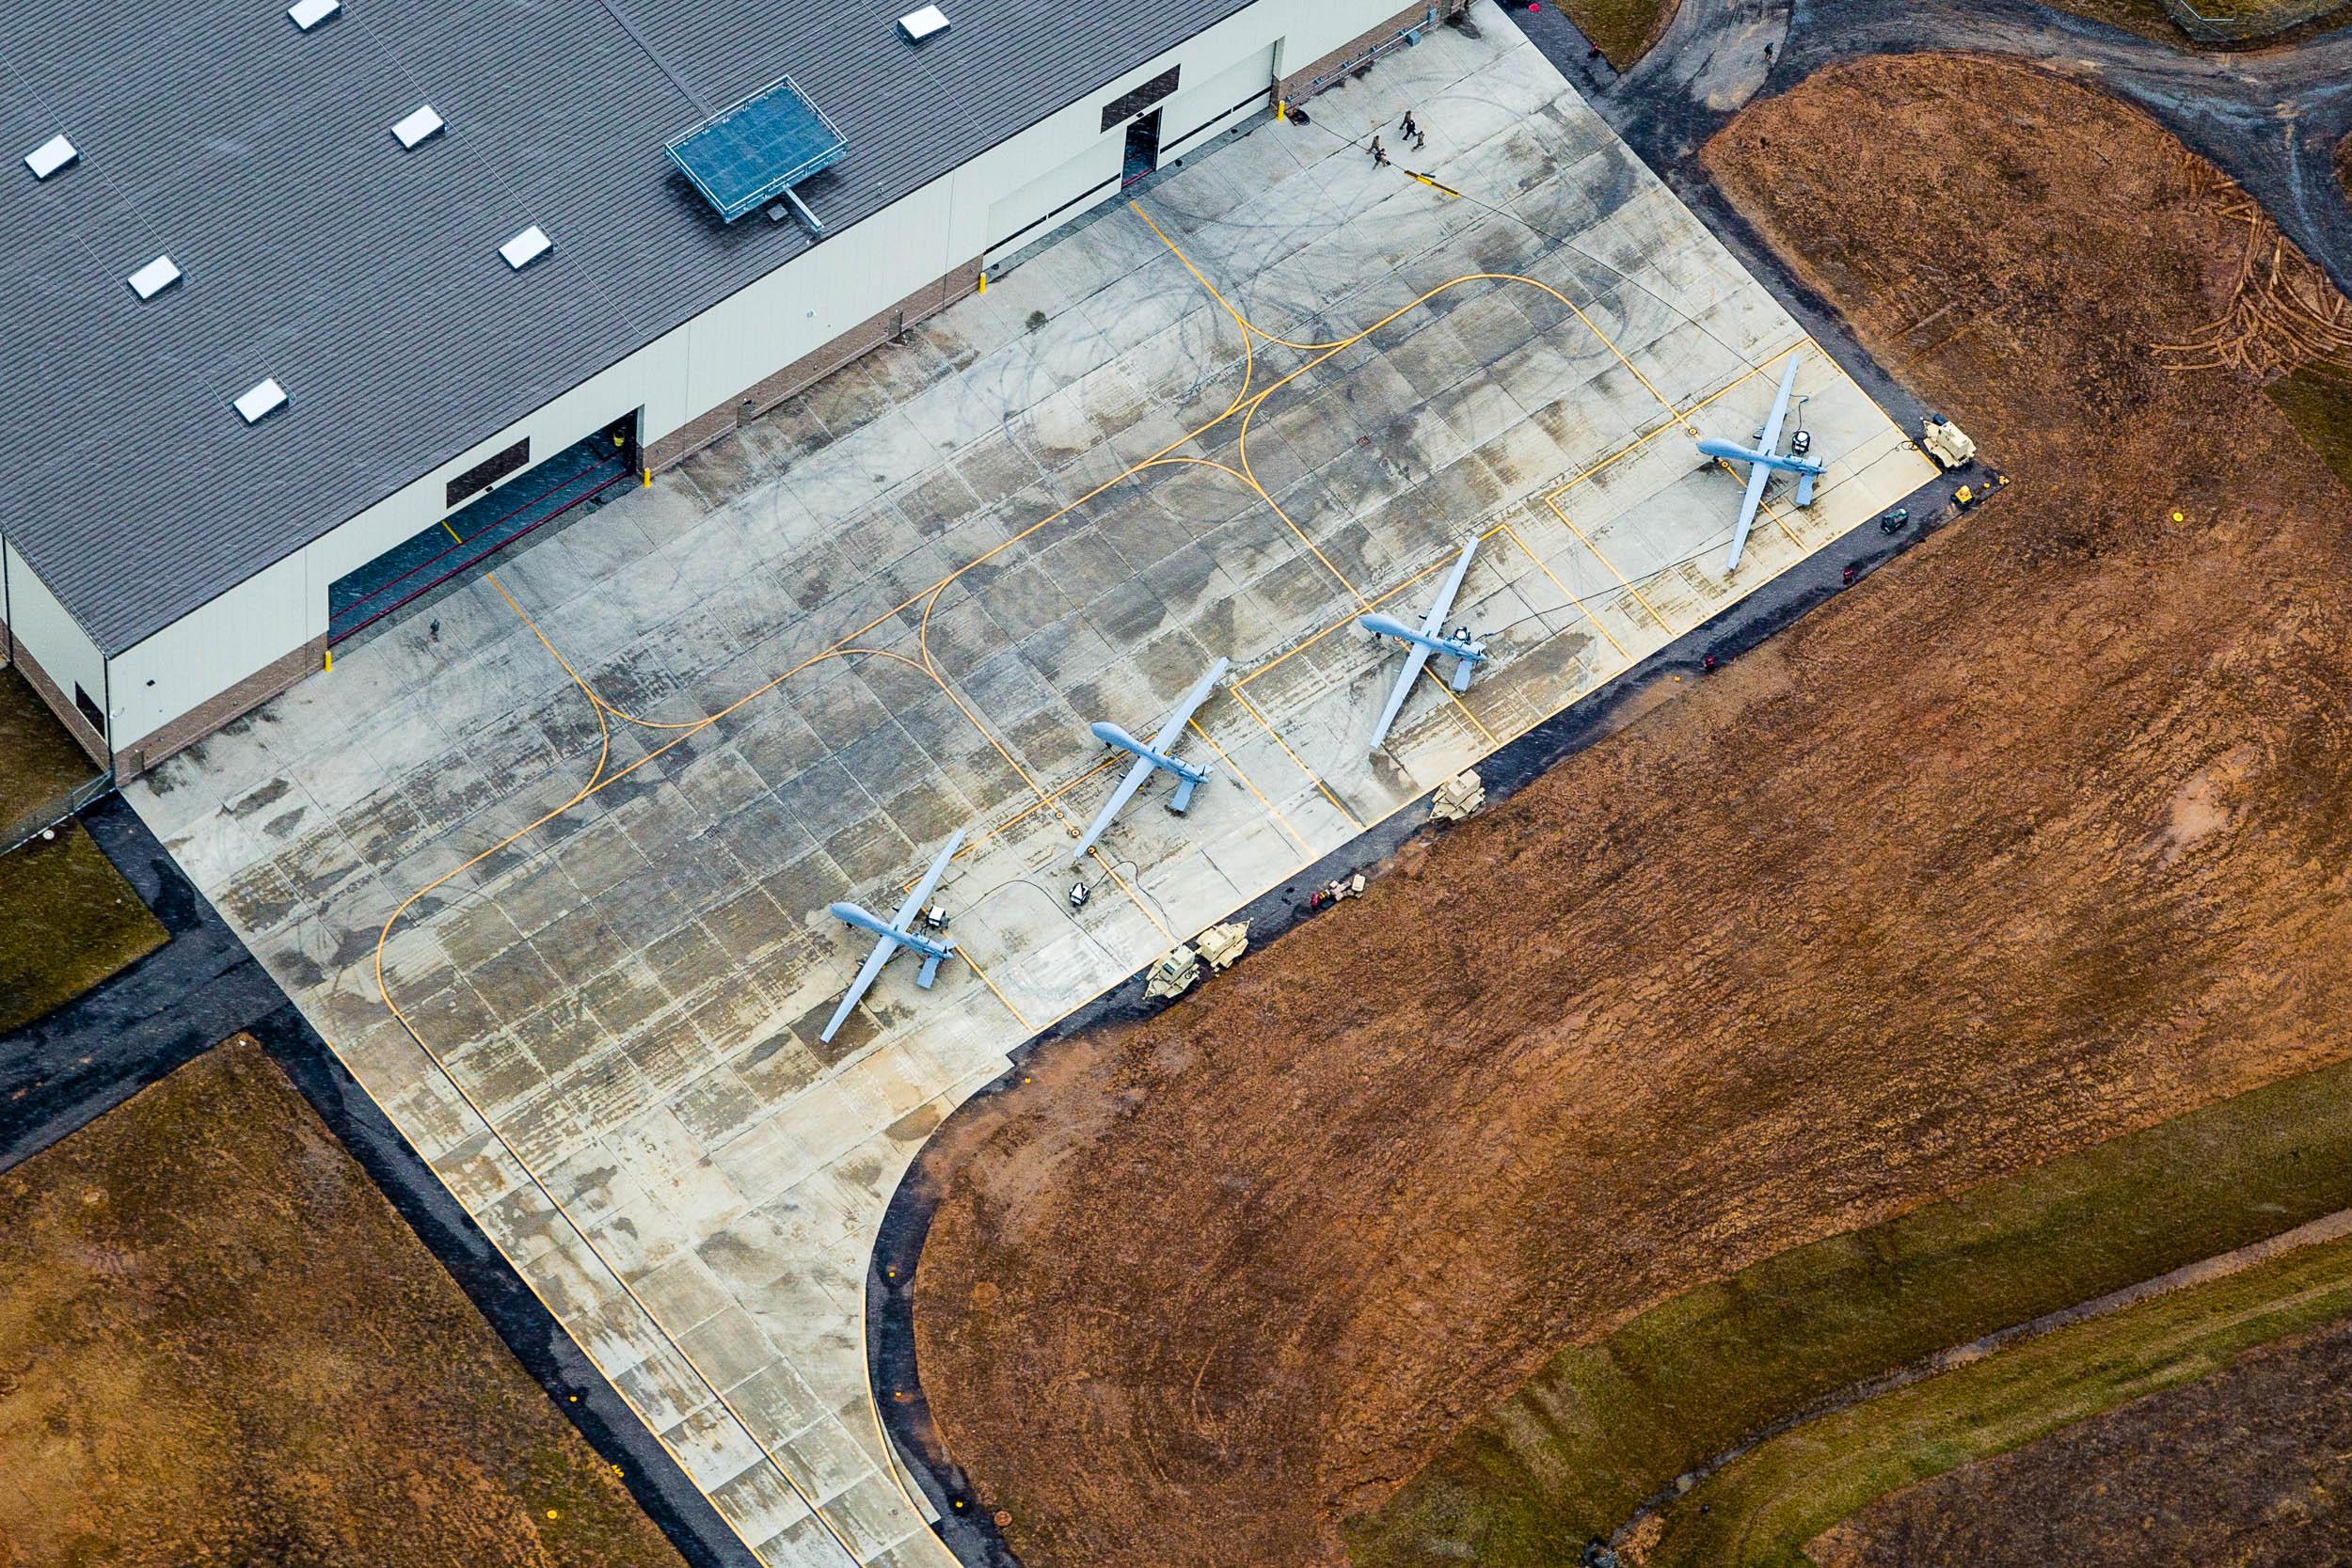 AerialFWN-8074_2500.jpg